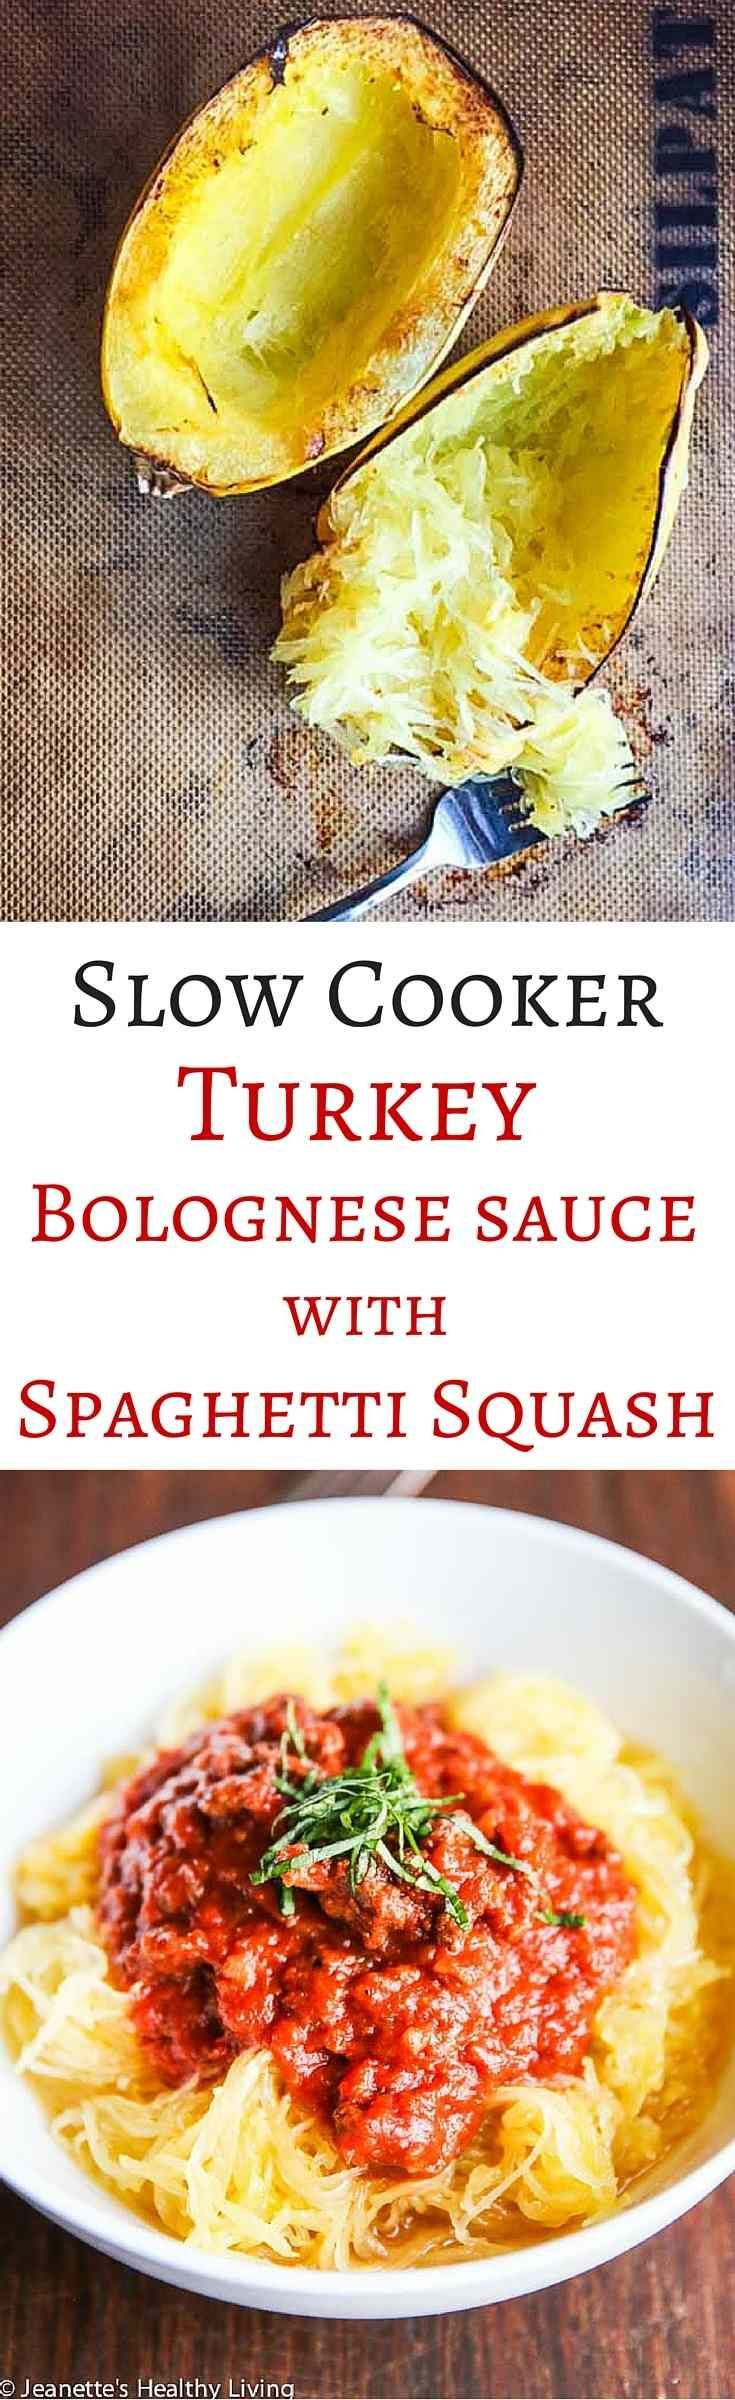 Slow Cooker Turkey Bolognese Sauce with Spaghetti Squash | Recipe ...